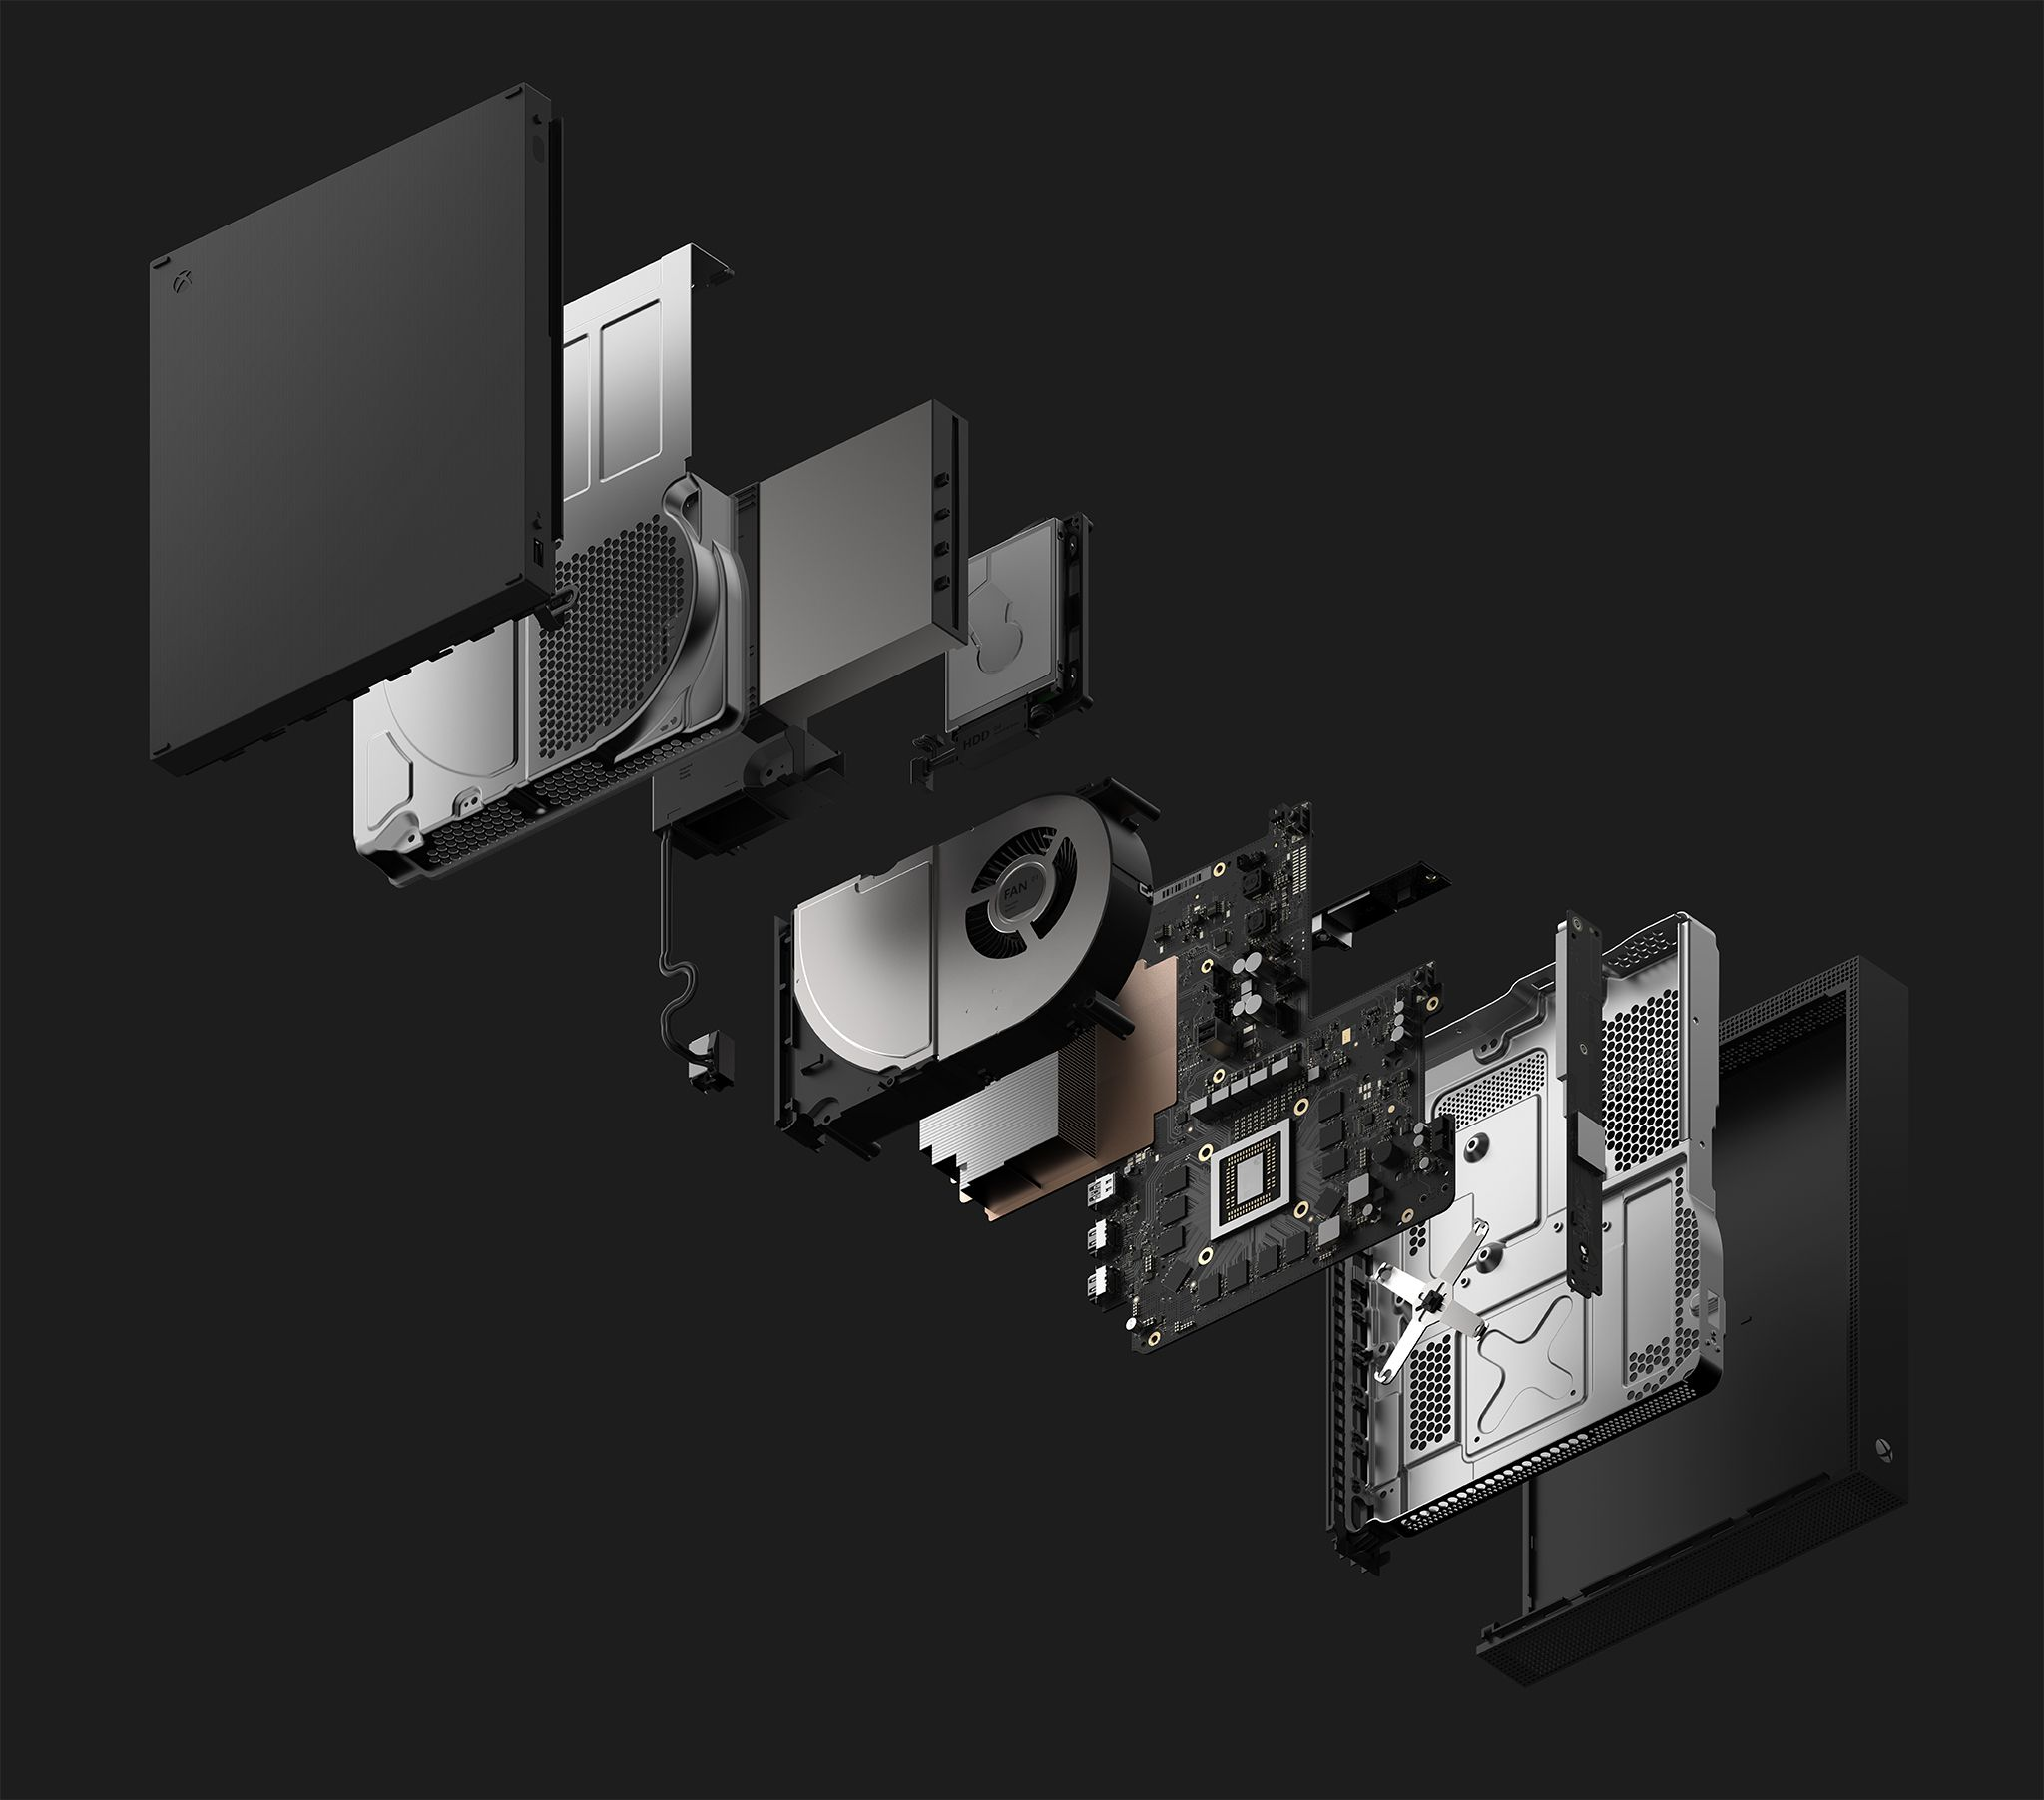 Xbox One Xнеявляется конкурентом PS4 Pro— Фил Спенсер